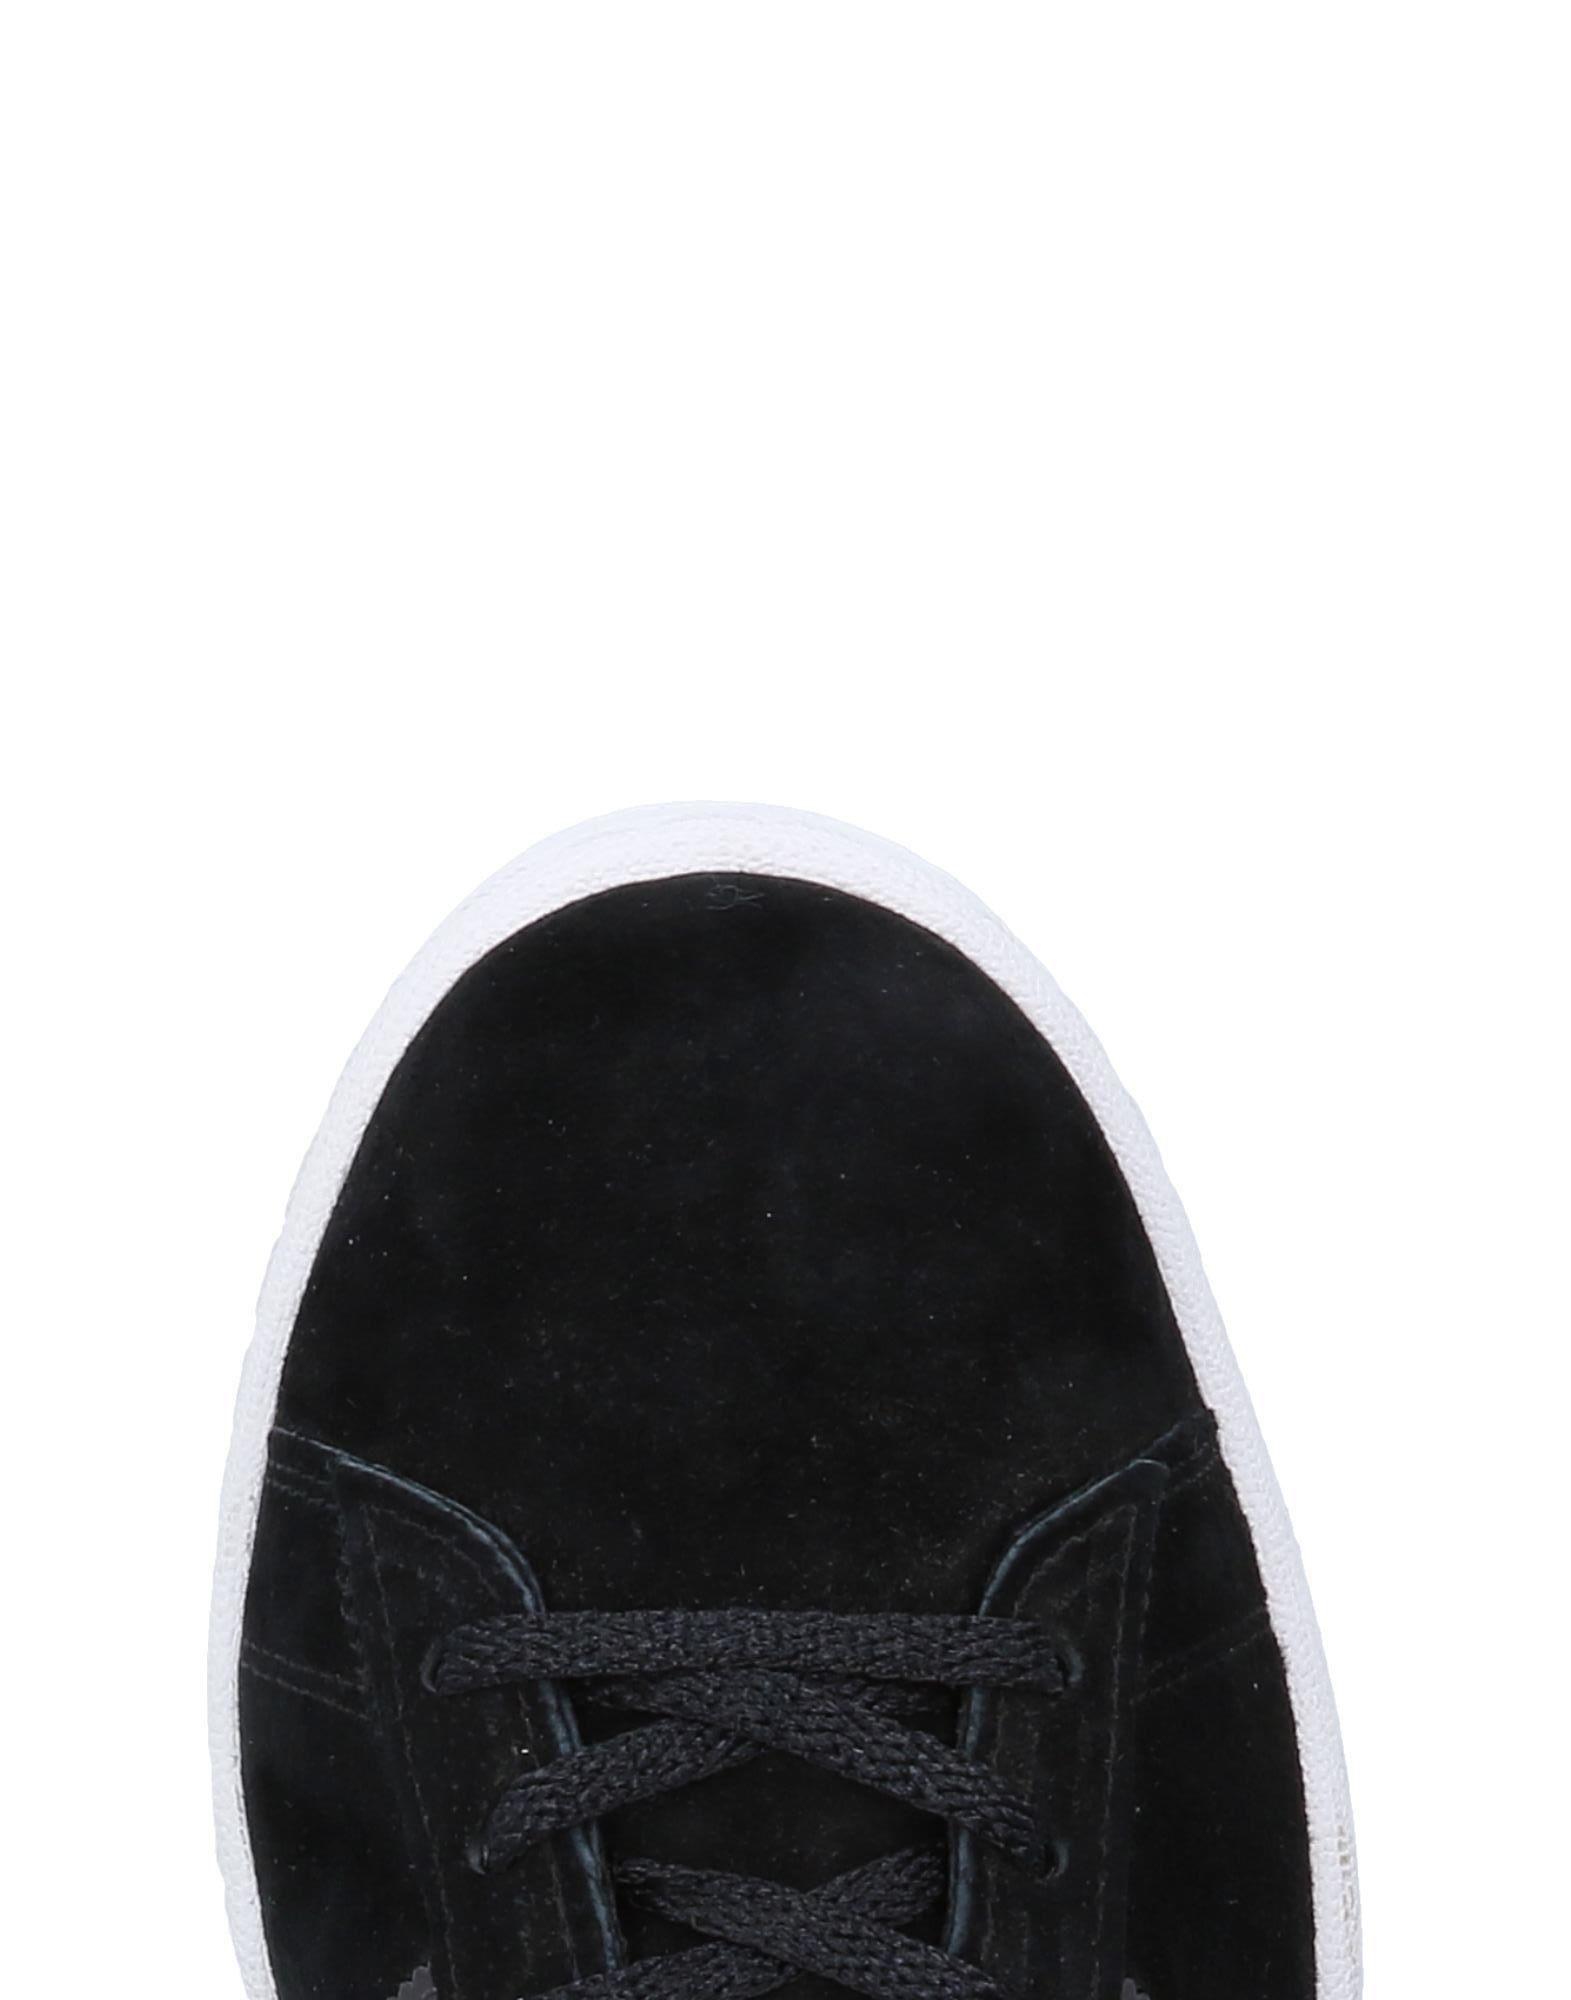 Adidas Originals Sneakers Damen  Schuhe 11454739FX Gute Qualität beliebte Schuhe  03acad